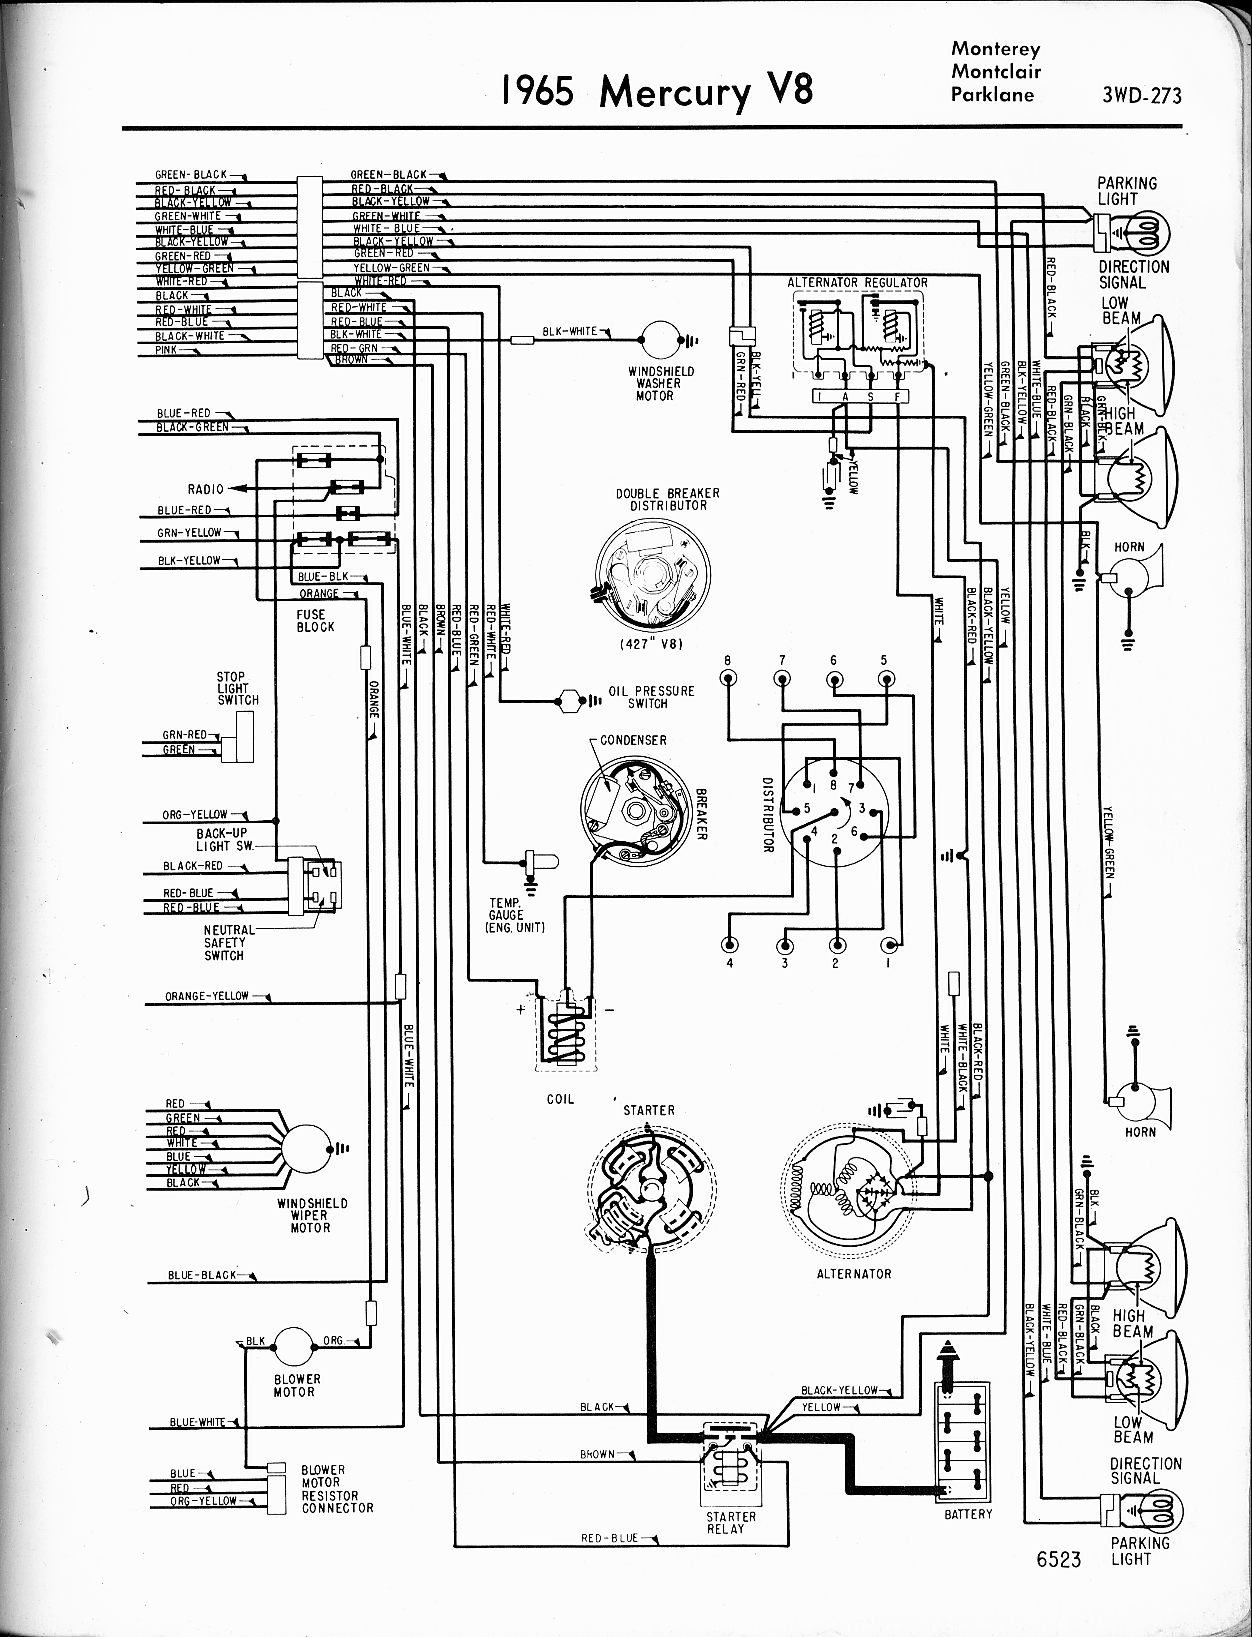 Faze Tach Wiring Diagram - Oer Tach Wiring Diagram on ignition diagram, turn signal diagram, gas gauge diagram, speedometer diagram, light switch diagram, fuel gauge diagram, wiper motor diagram, voltage regulator diagram, tach filter diagram, starter relay diagram, steering wheel diagram, fuse diagram,